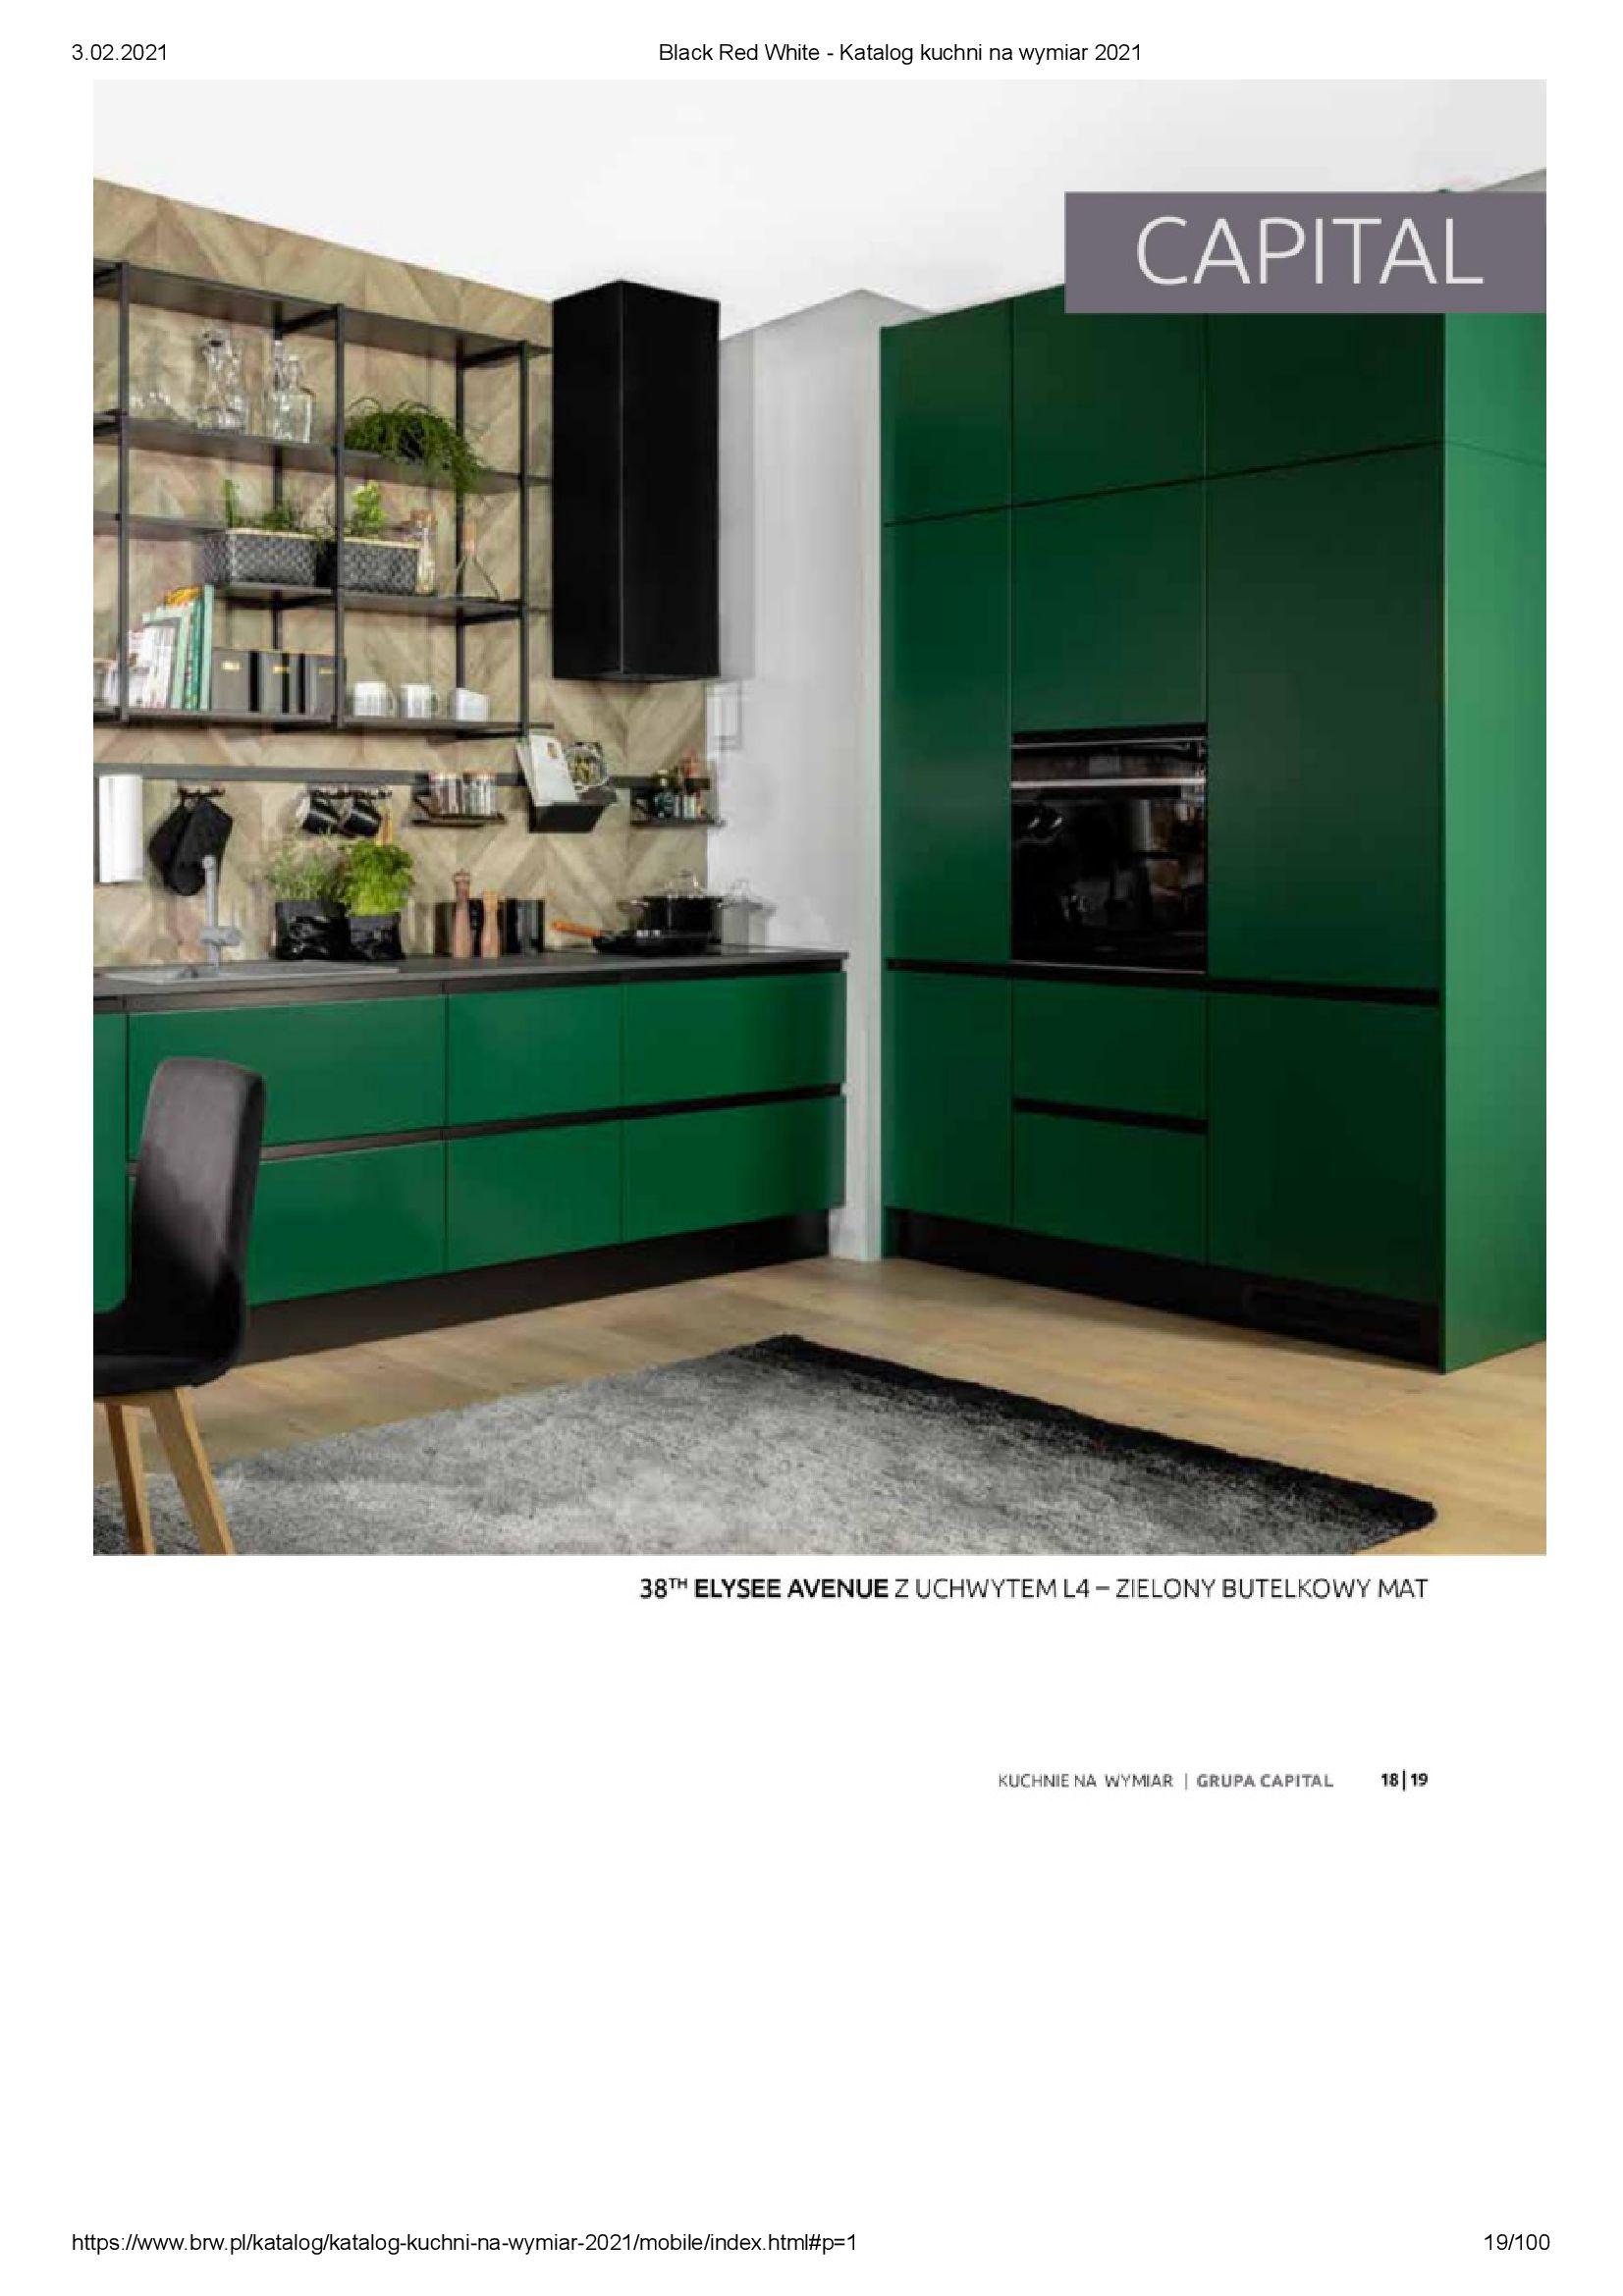 Gazetka Black Red White: Katalog - Kuchnie na wymiar Senso Kitchens 2021 2021-01-01 page-19